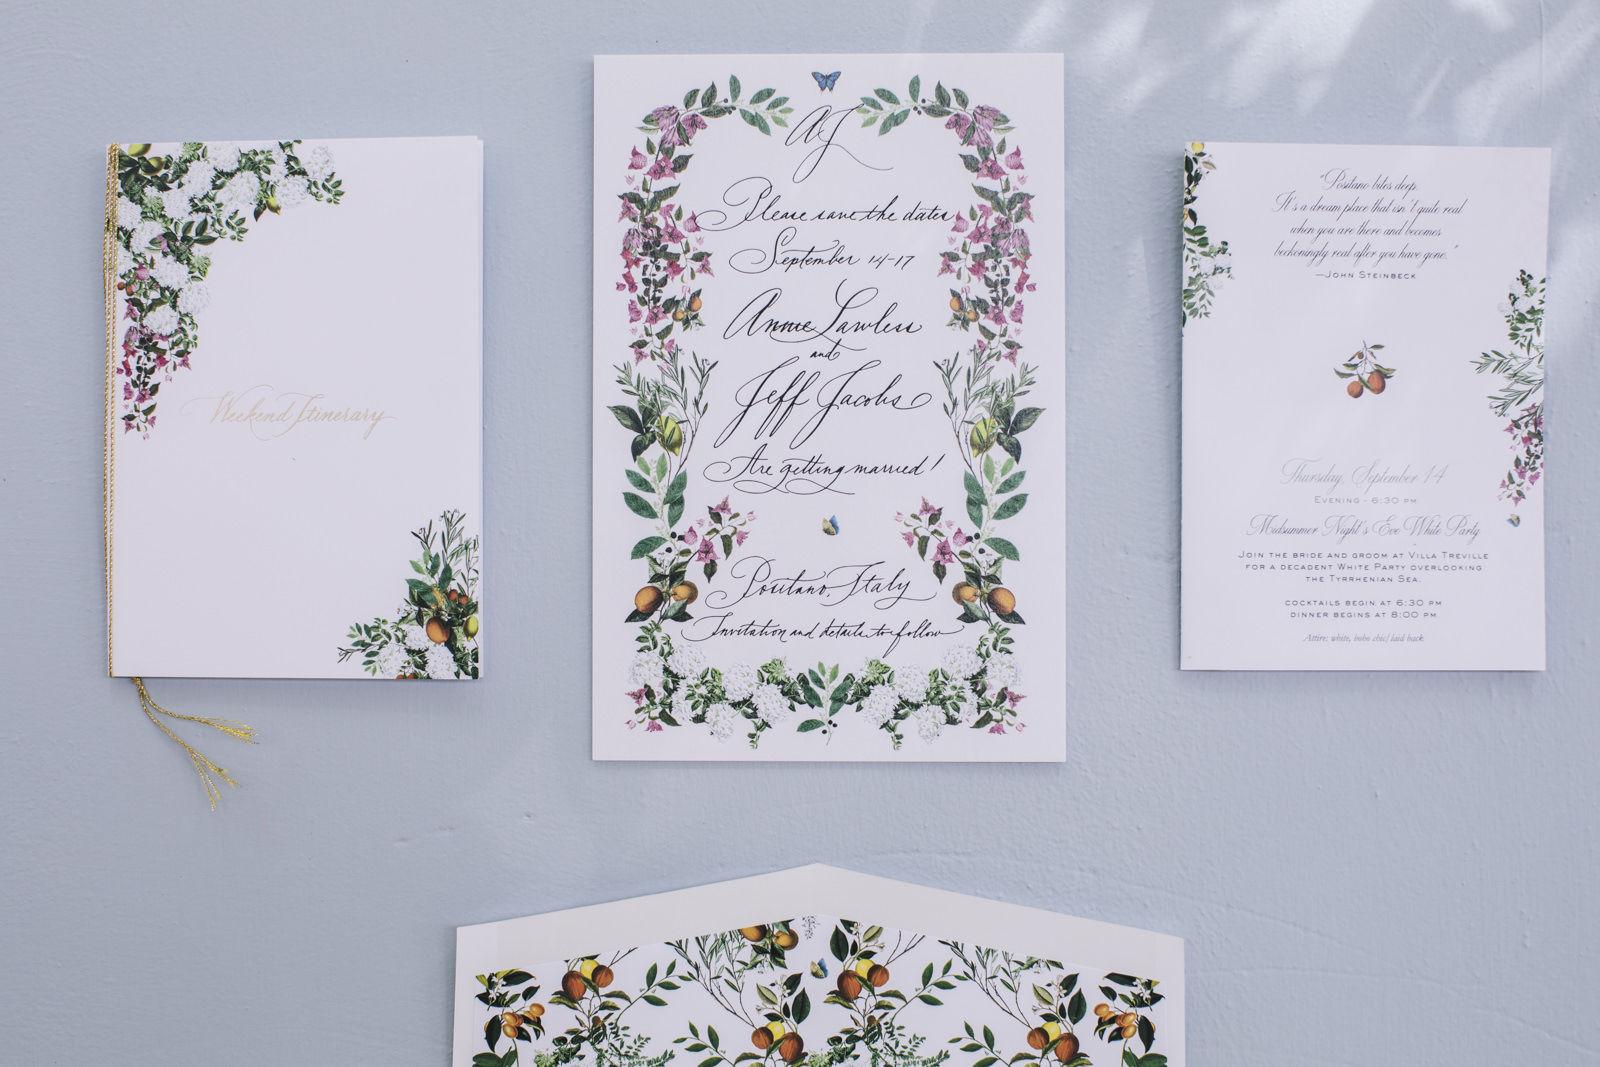 wedding invitation cards on a light blue wall